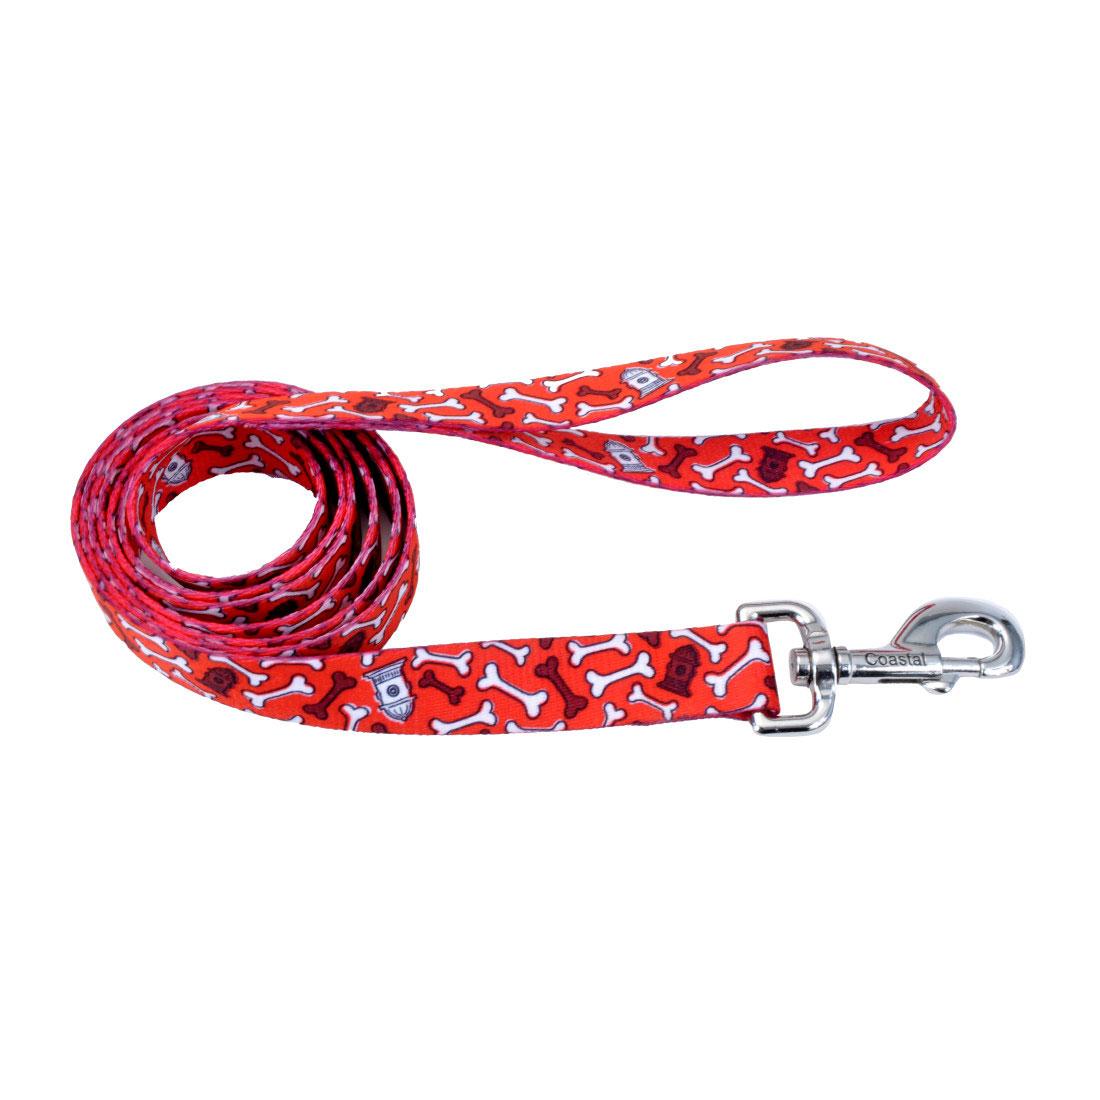 Styles Dog Leash, Red Bones, 3/4-inx6-ft